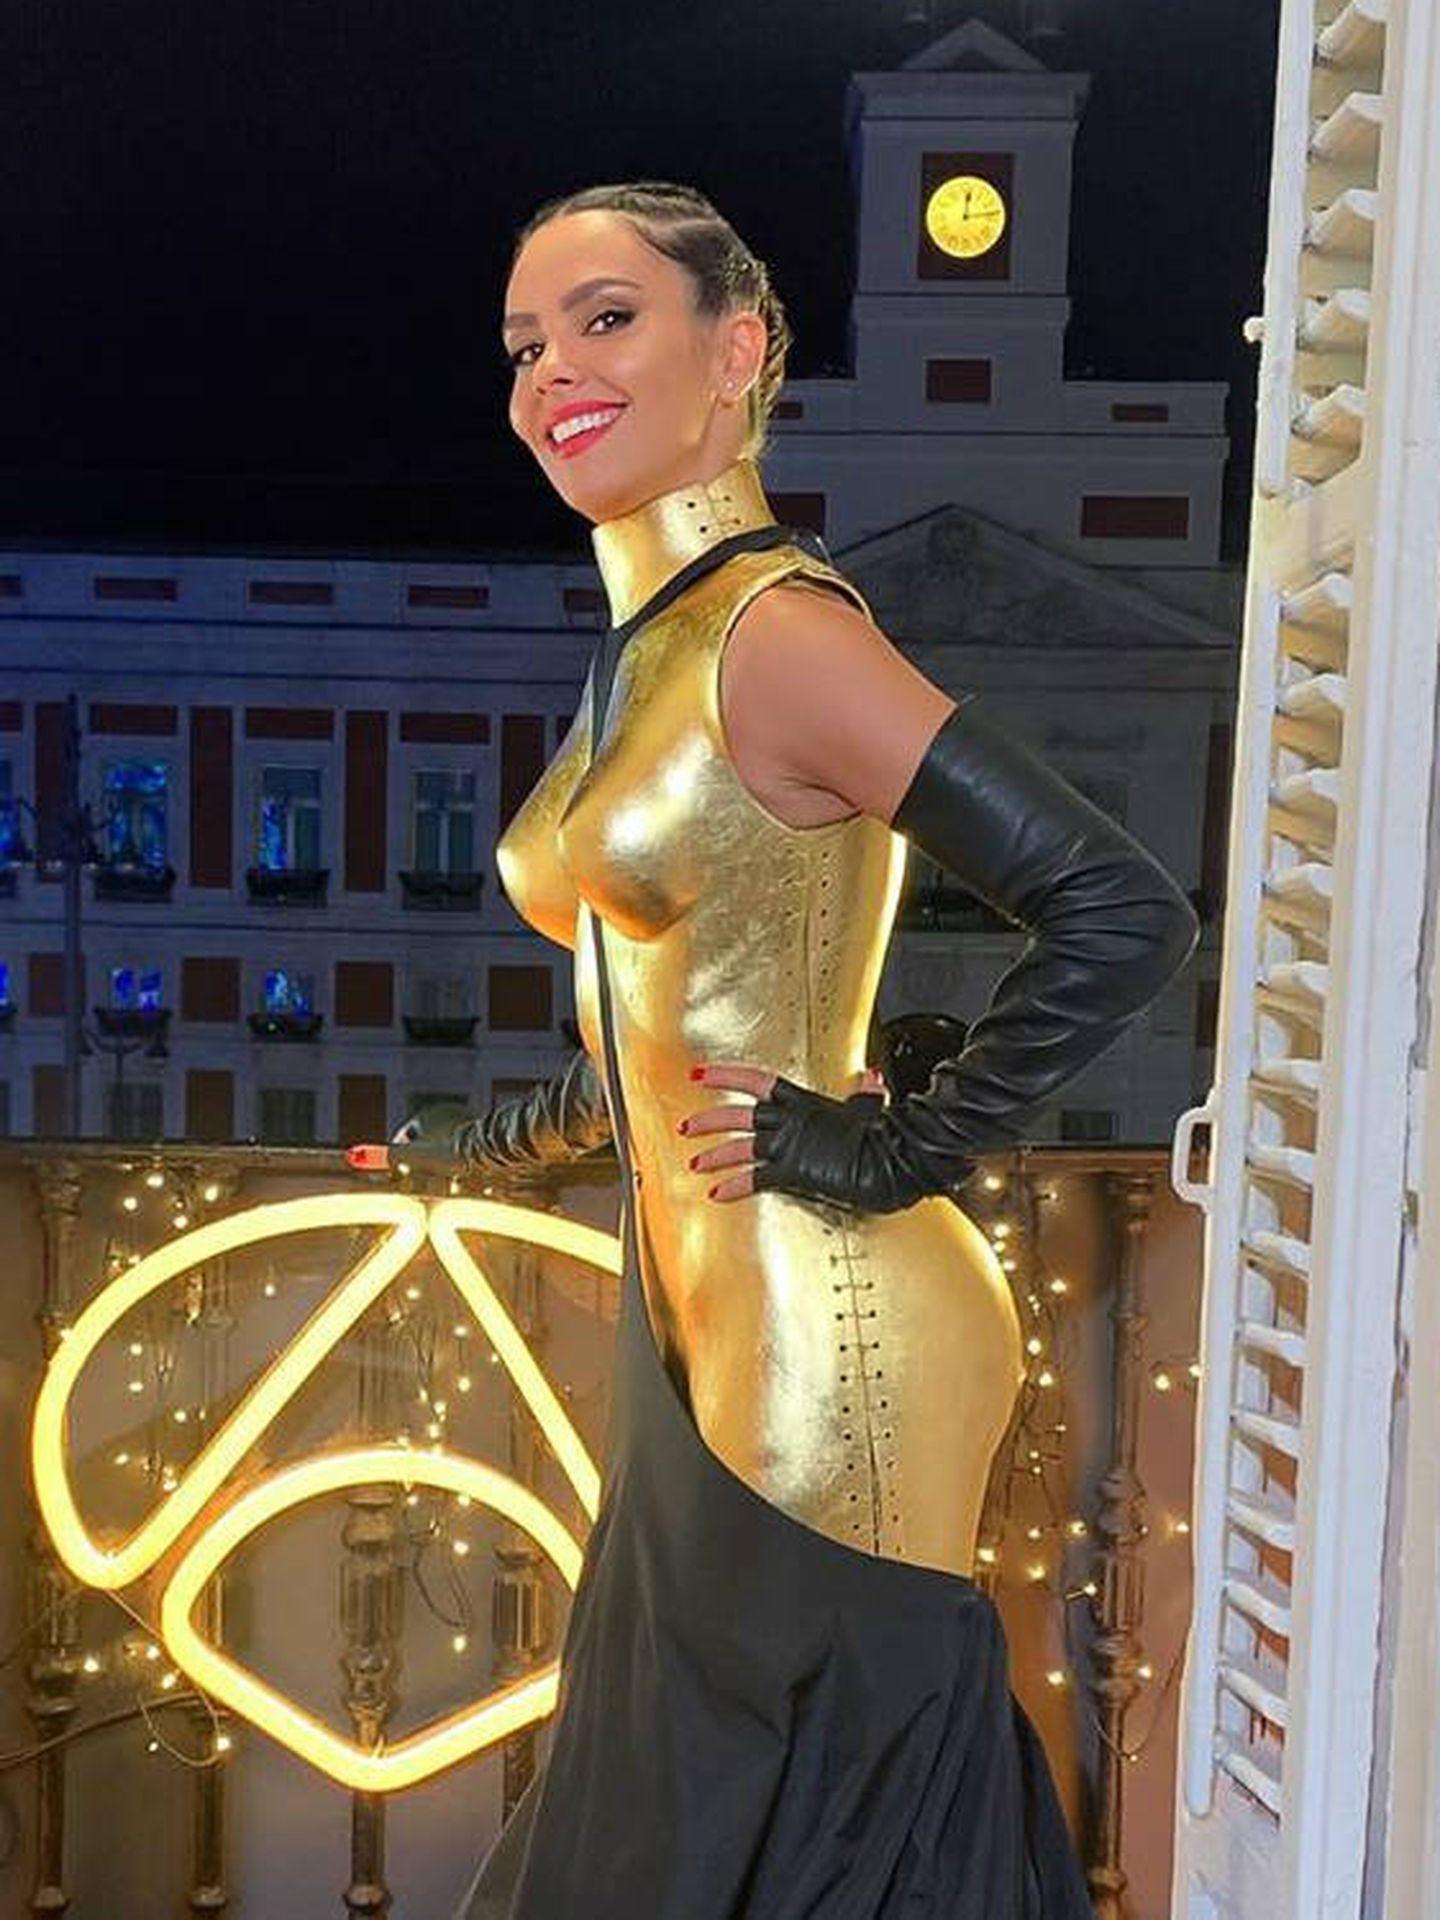 Cristina Pedroche, en el balcón de la Puerta del Sol. (Instagram Pedroche)